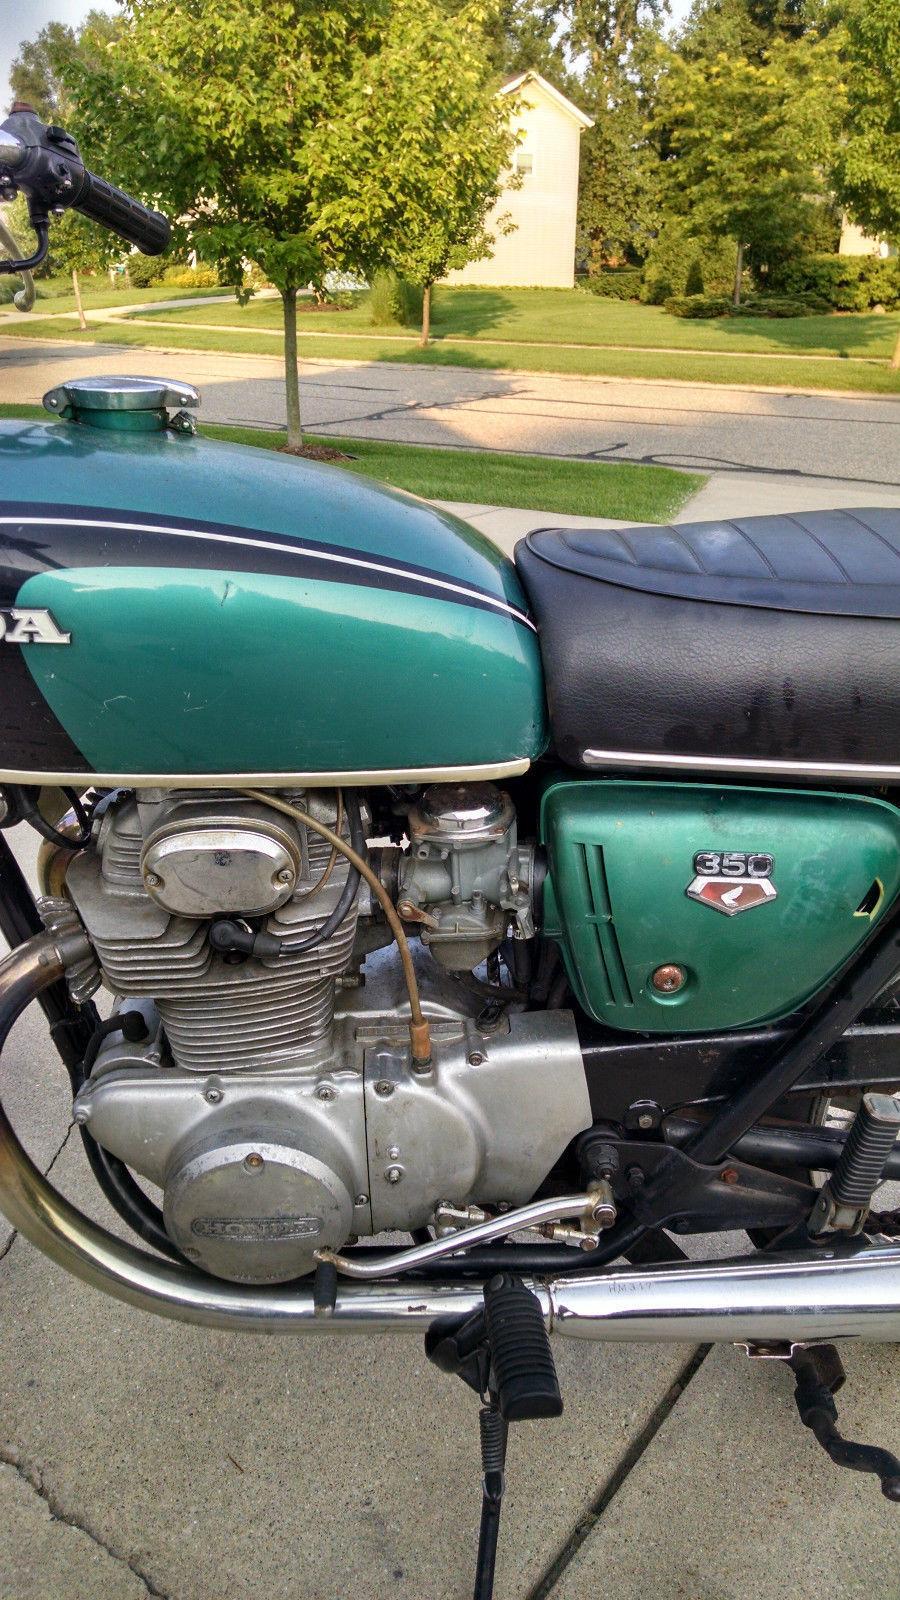 1971 honda cb 350 k3 motorcycle